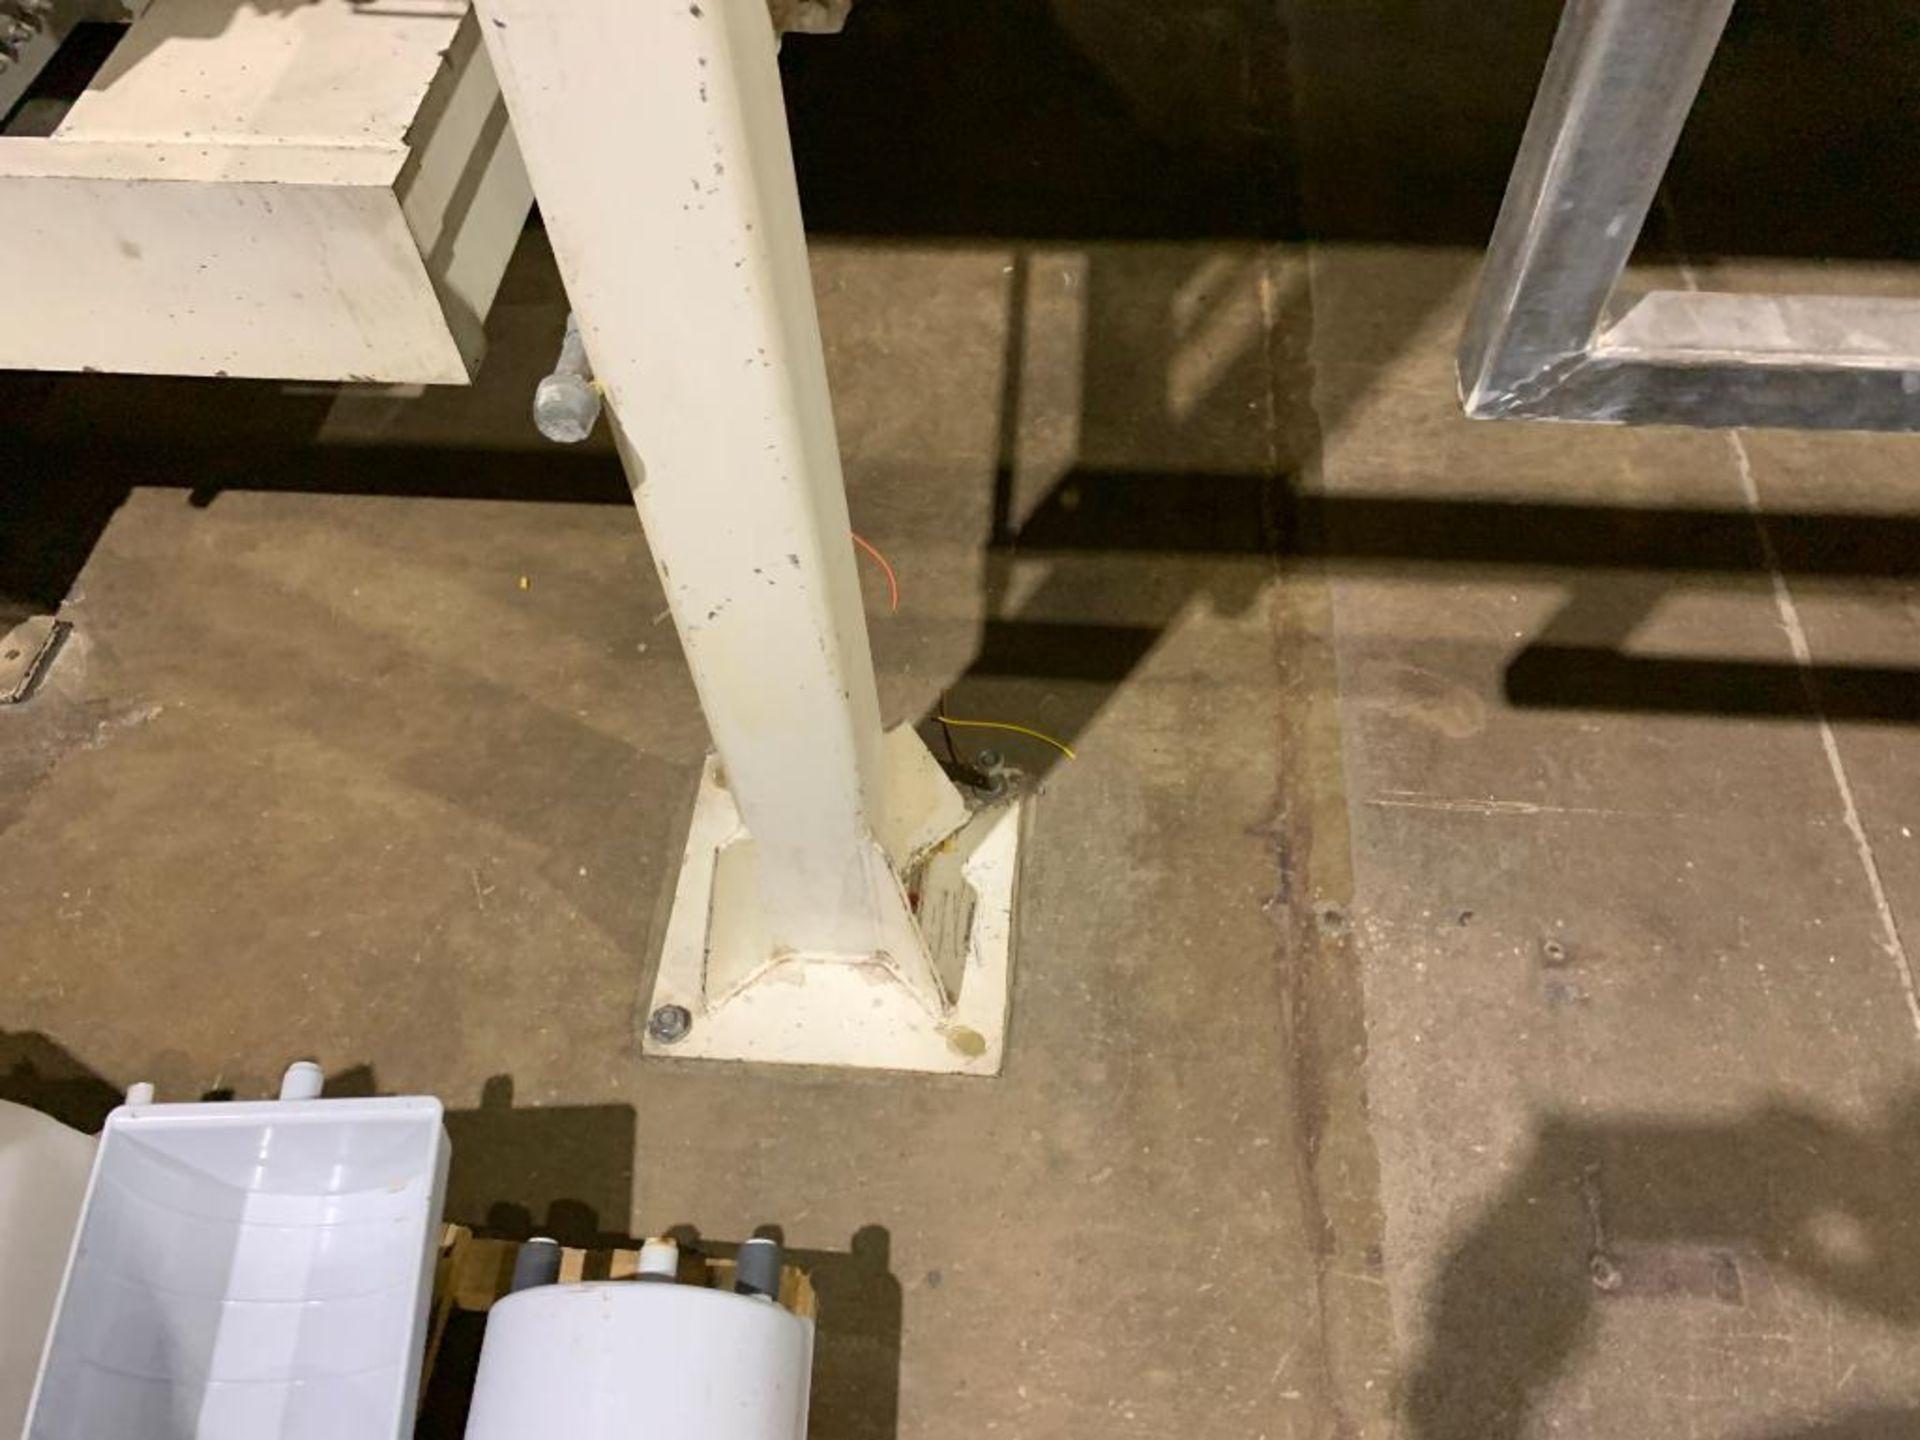 Aseeco mild steel cone bottom bulk storage bin - Image 4 of 23